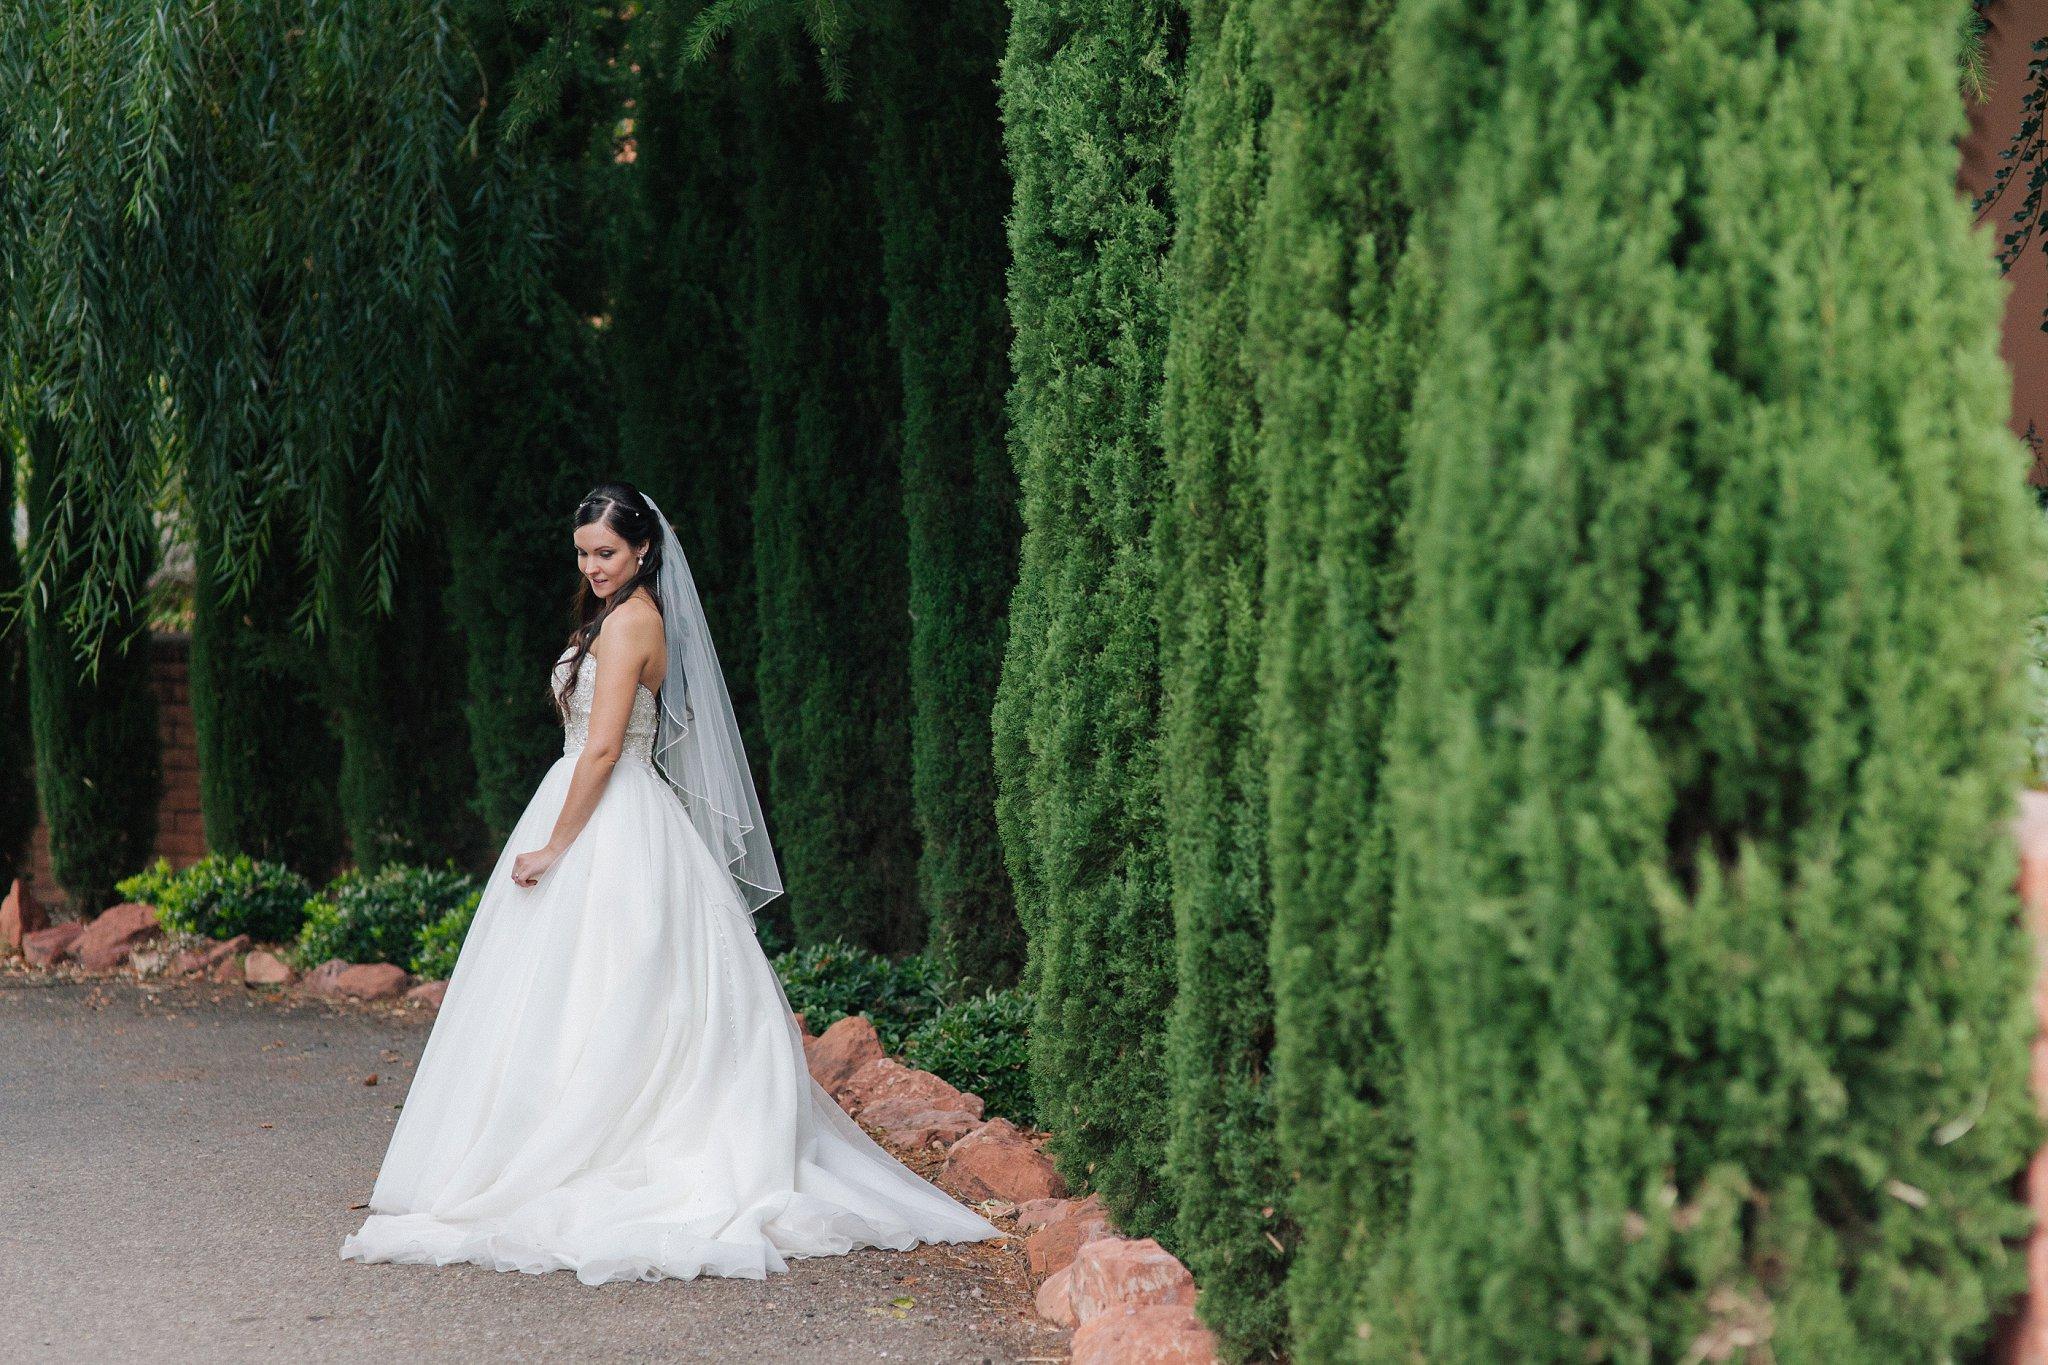 Sedona bride portrait